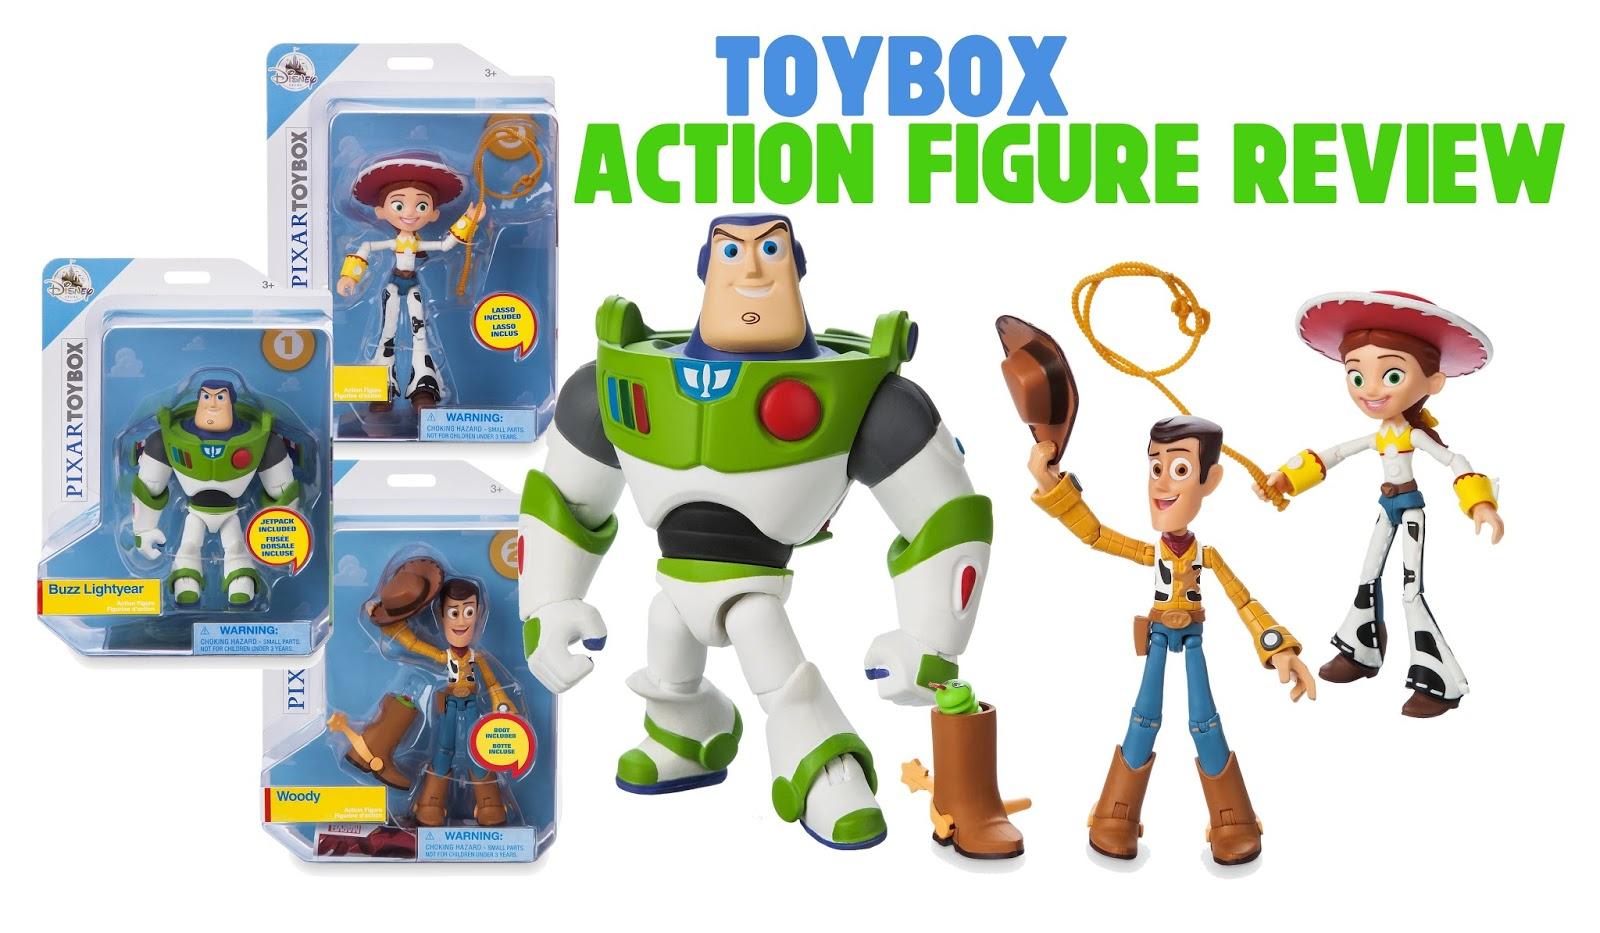 Disney Pixar Monsters University 3 Piece Room In A Box: Shop Disney's Pixar Toybox Action Figures